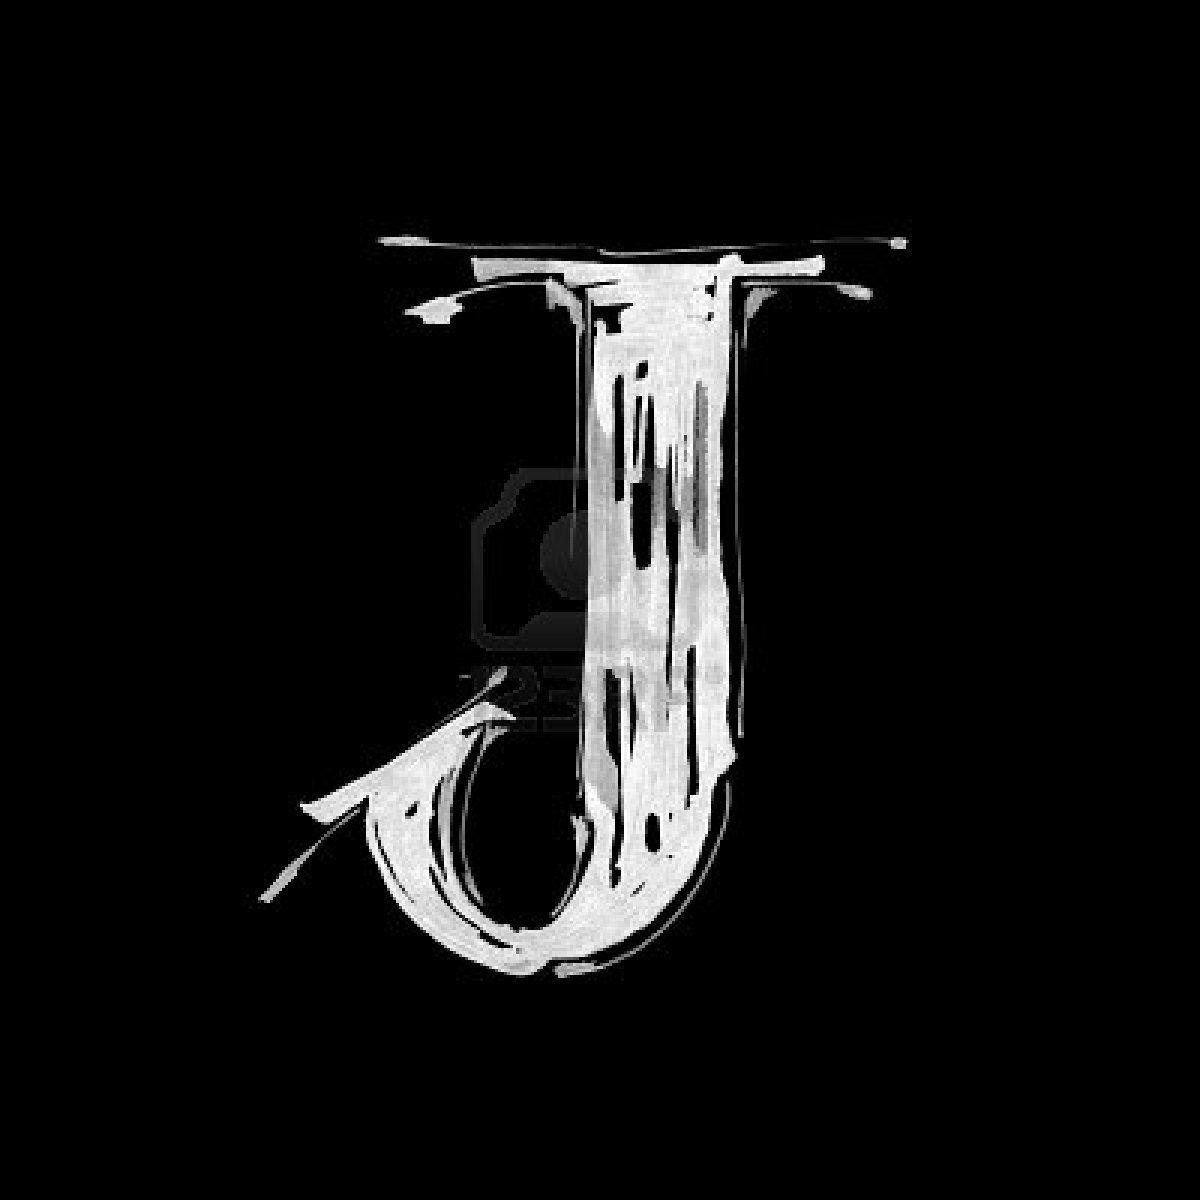 J Alphabet Wallpaper In Heart You can downloa...